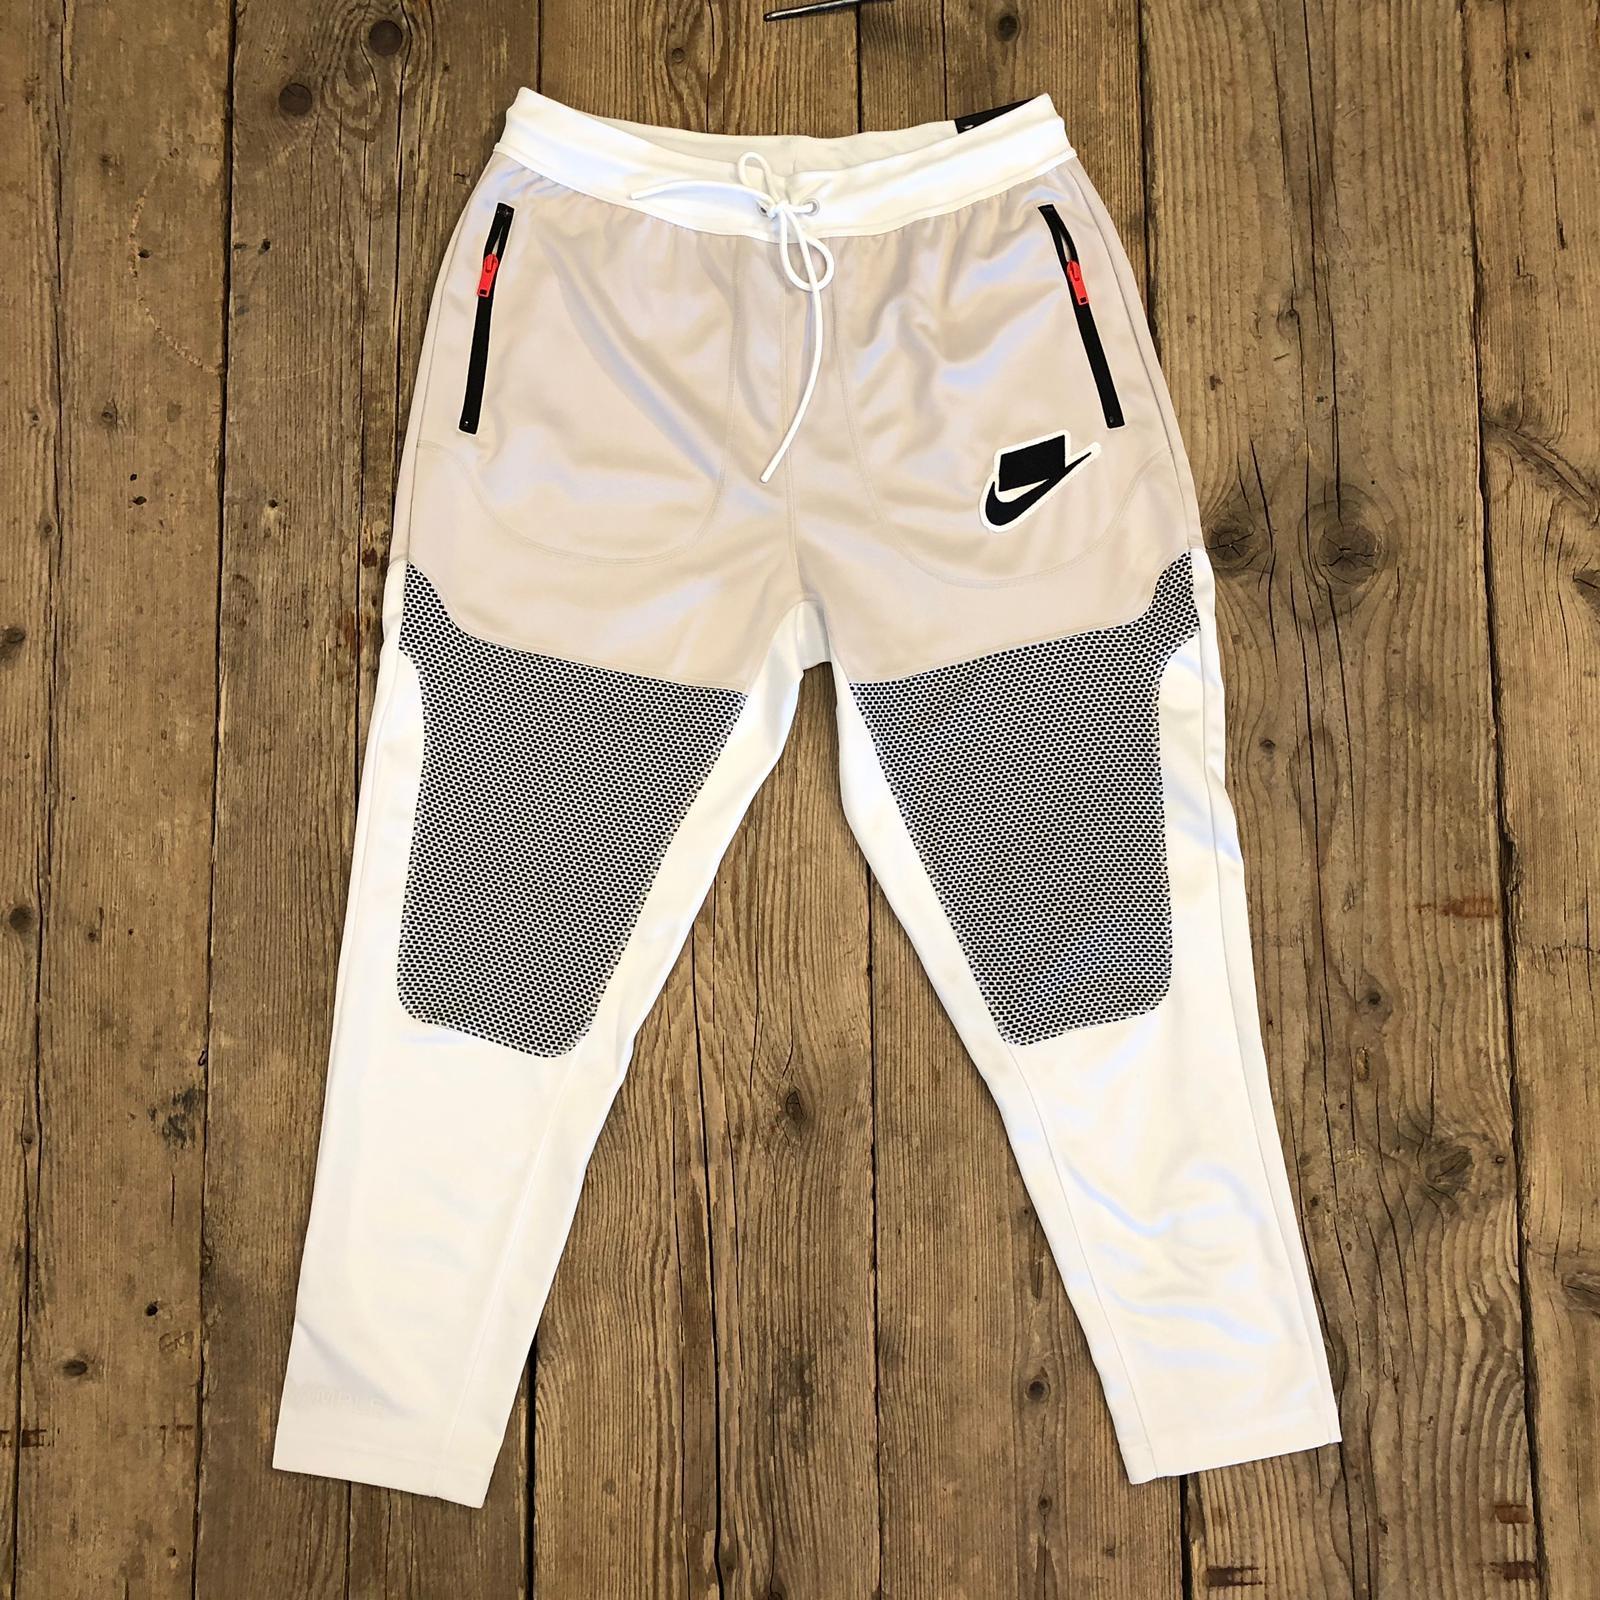 Pantalone Nike Sportswear NSW Bianco Con Inserti Neri